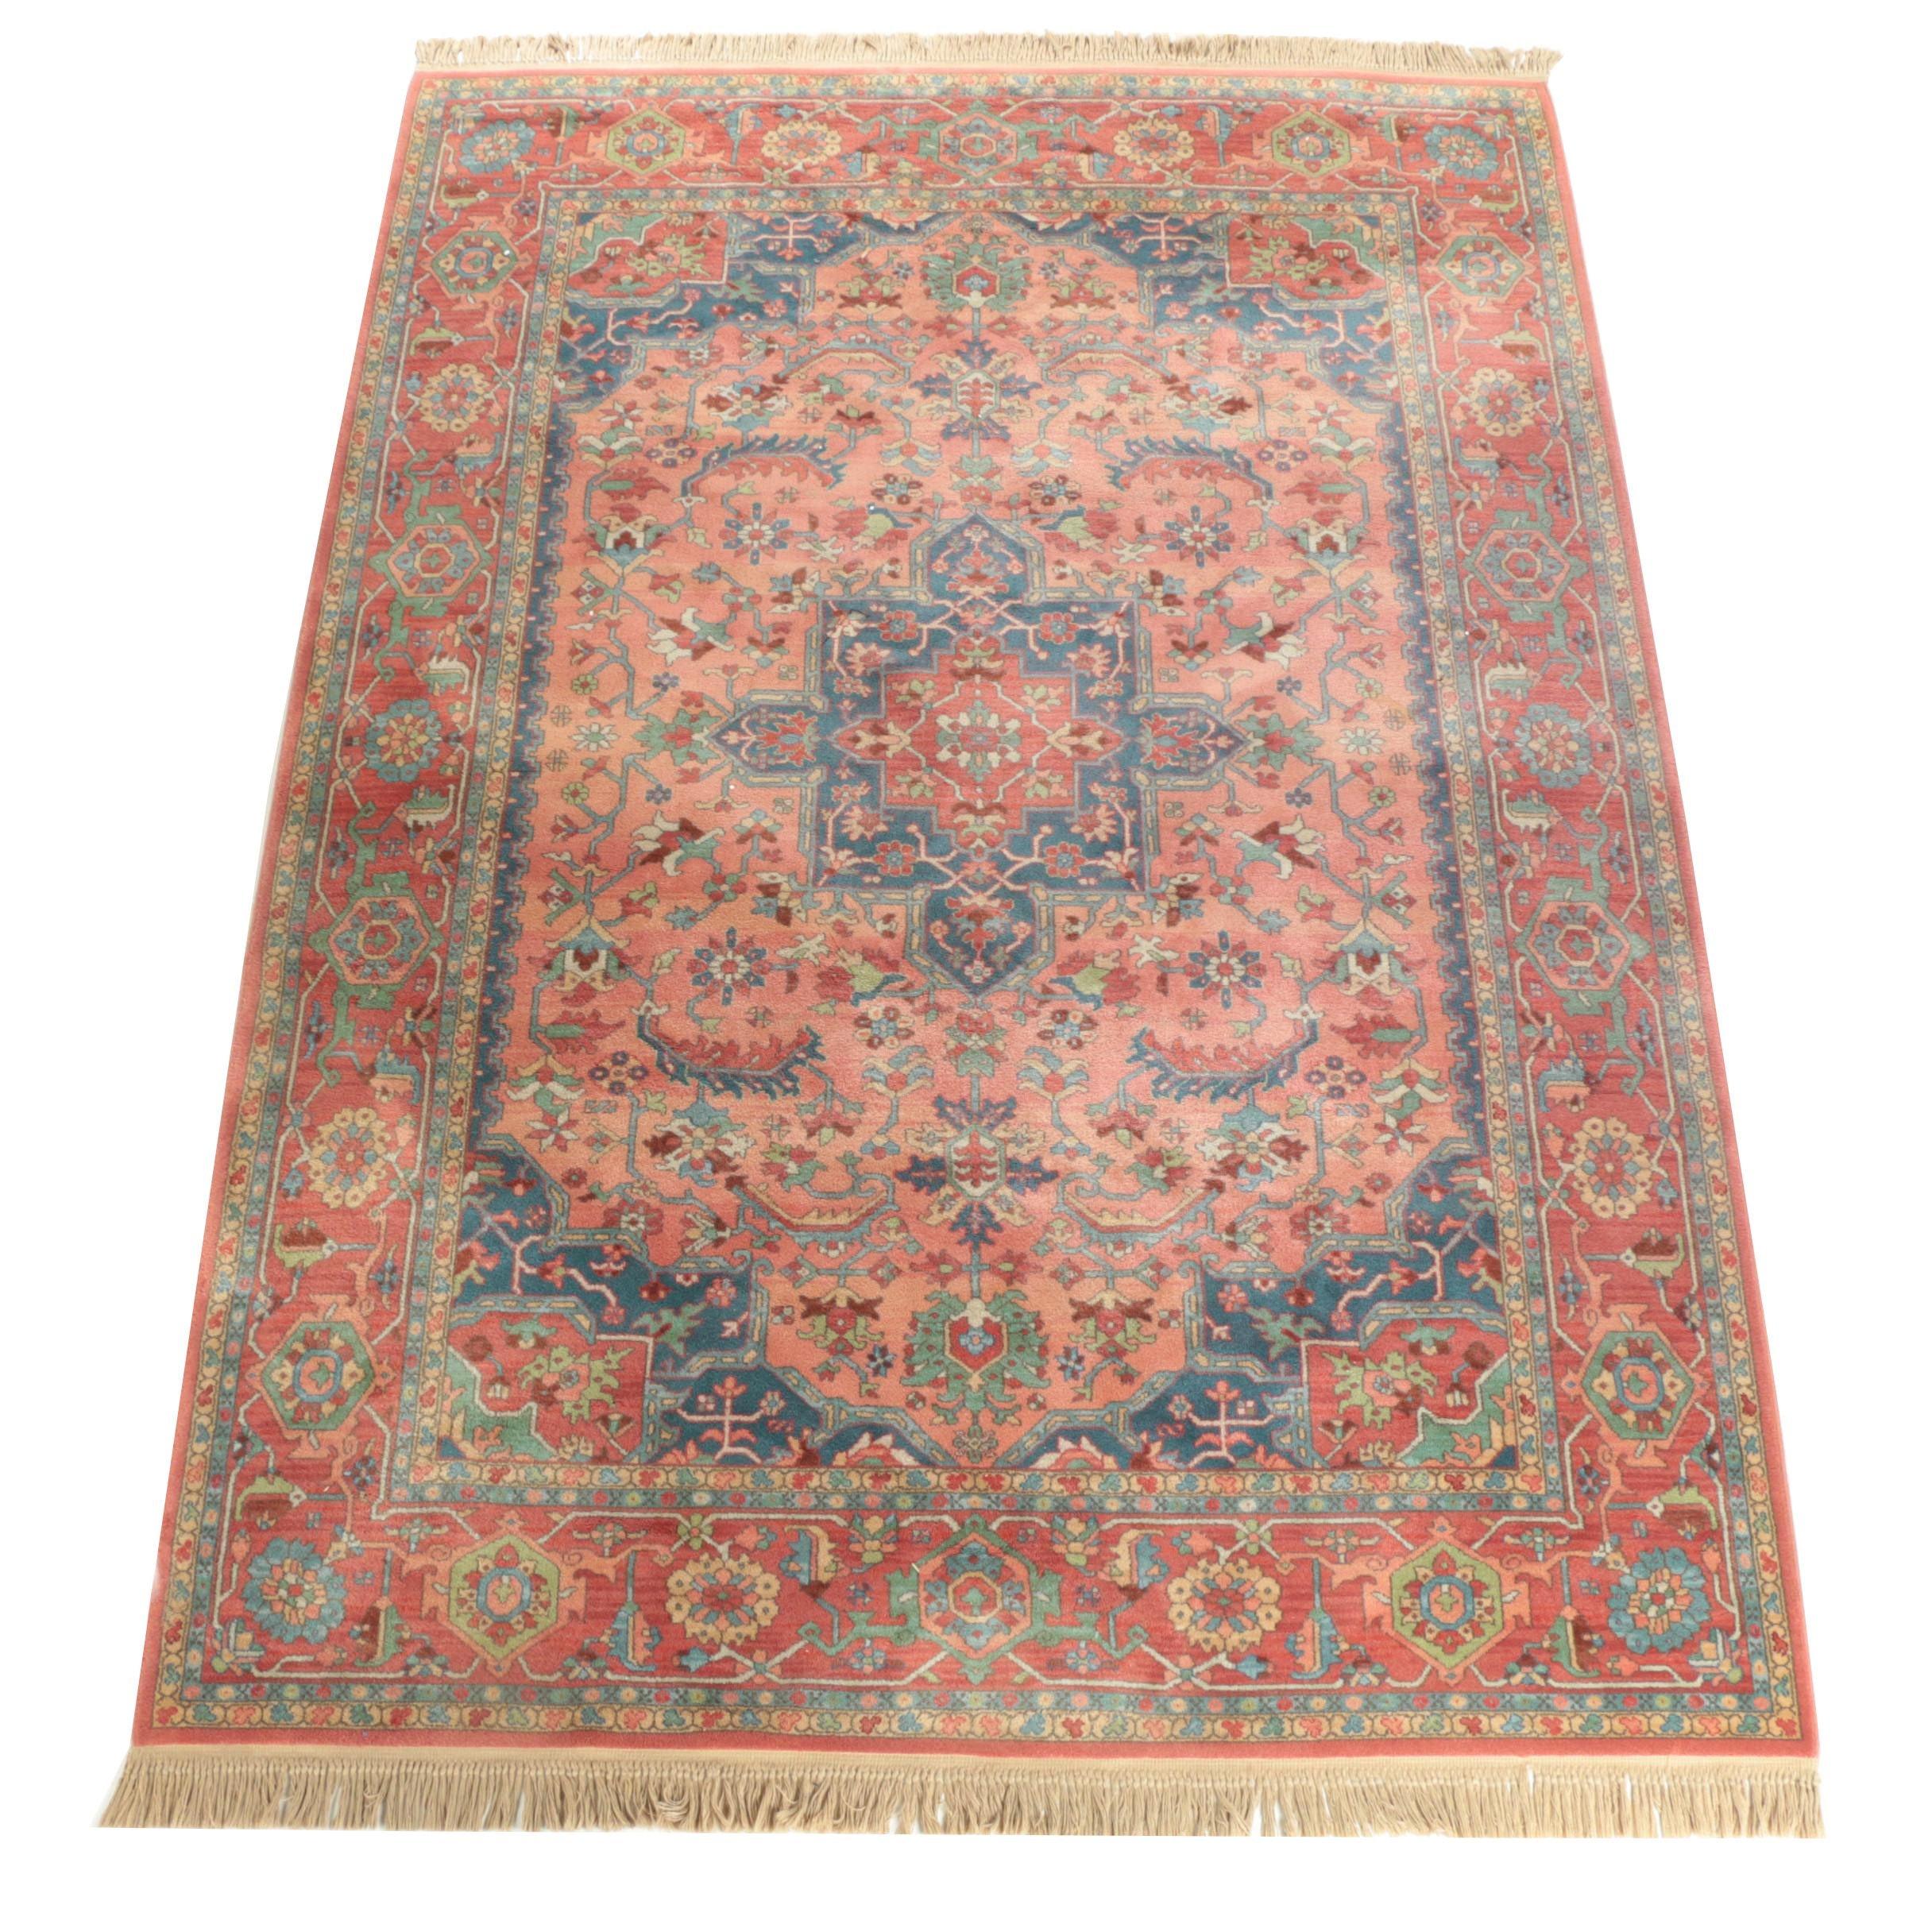 "Power-Loomed Karastan ""Medallion Serapi"" Wool Room Sized Rug"